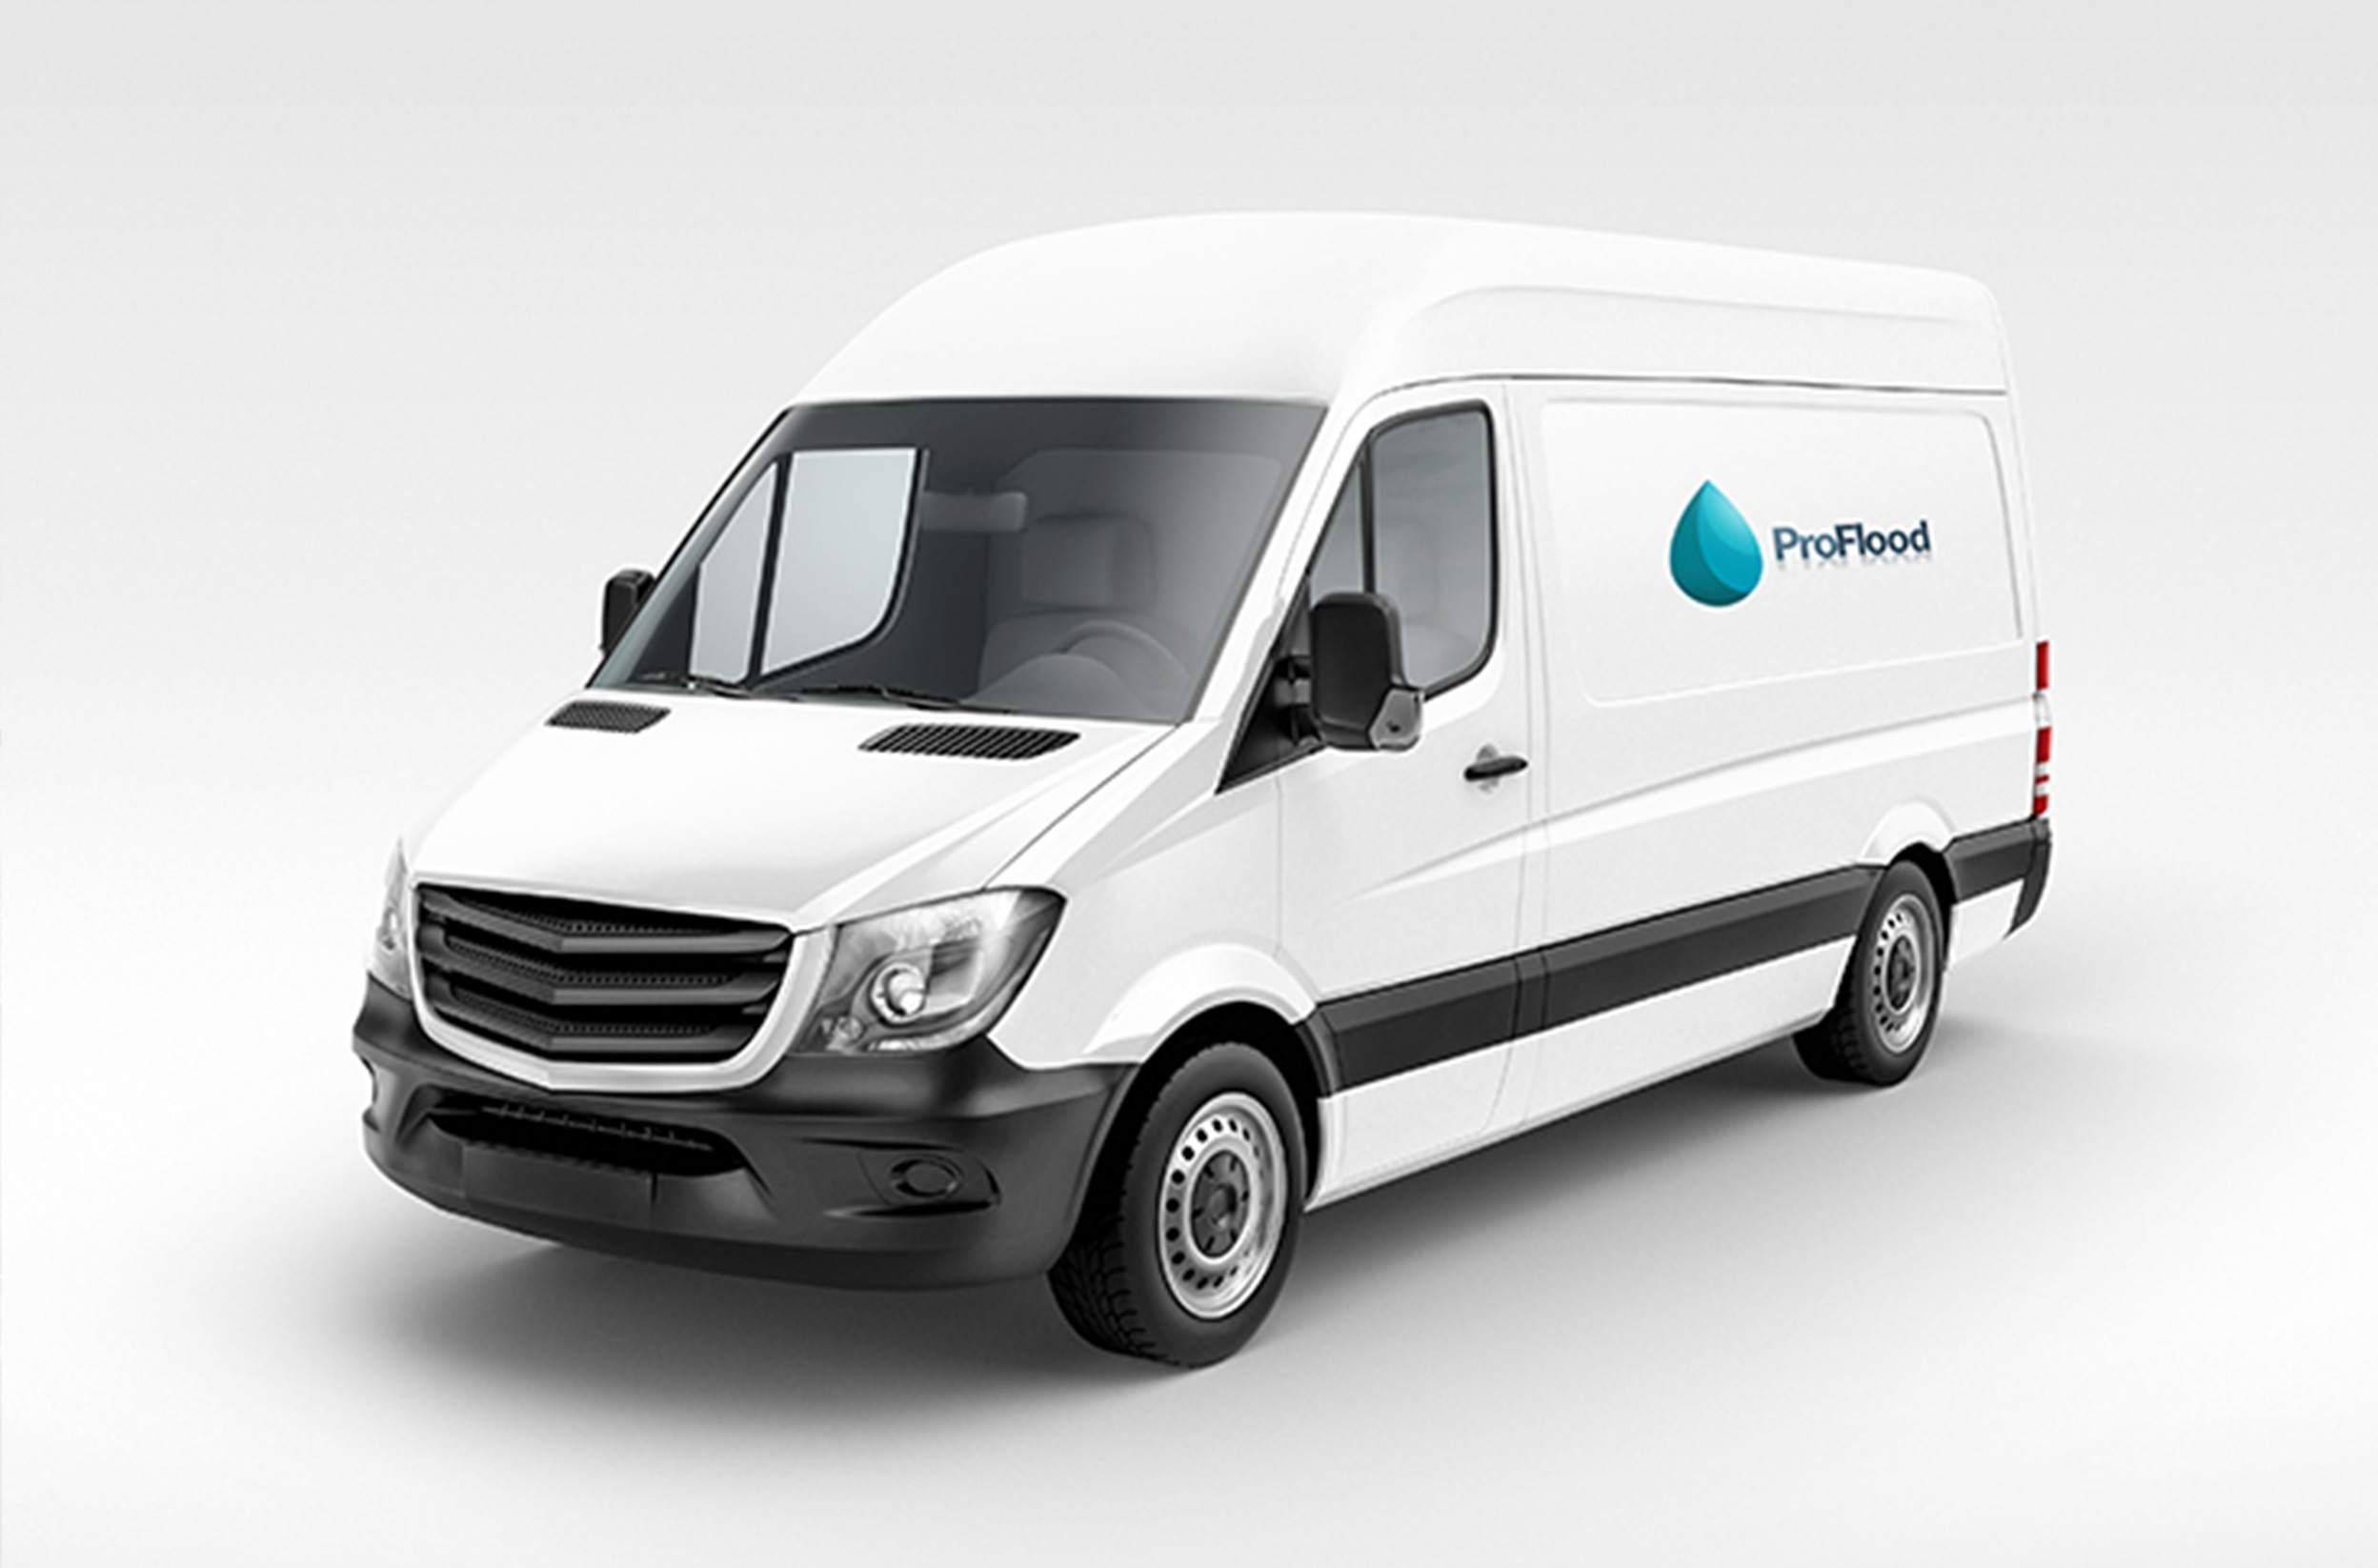 PINTEREST_proflood_vehicle